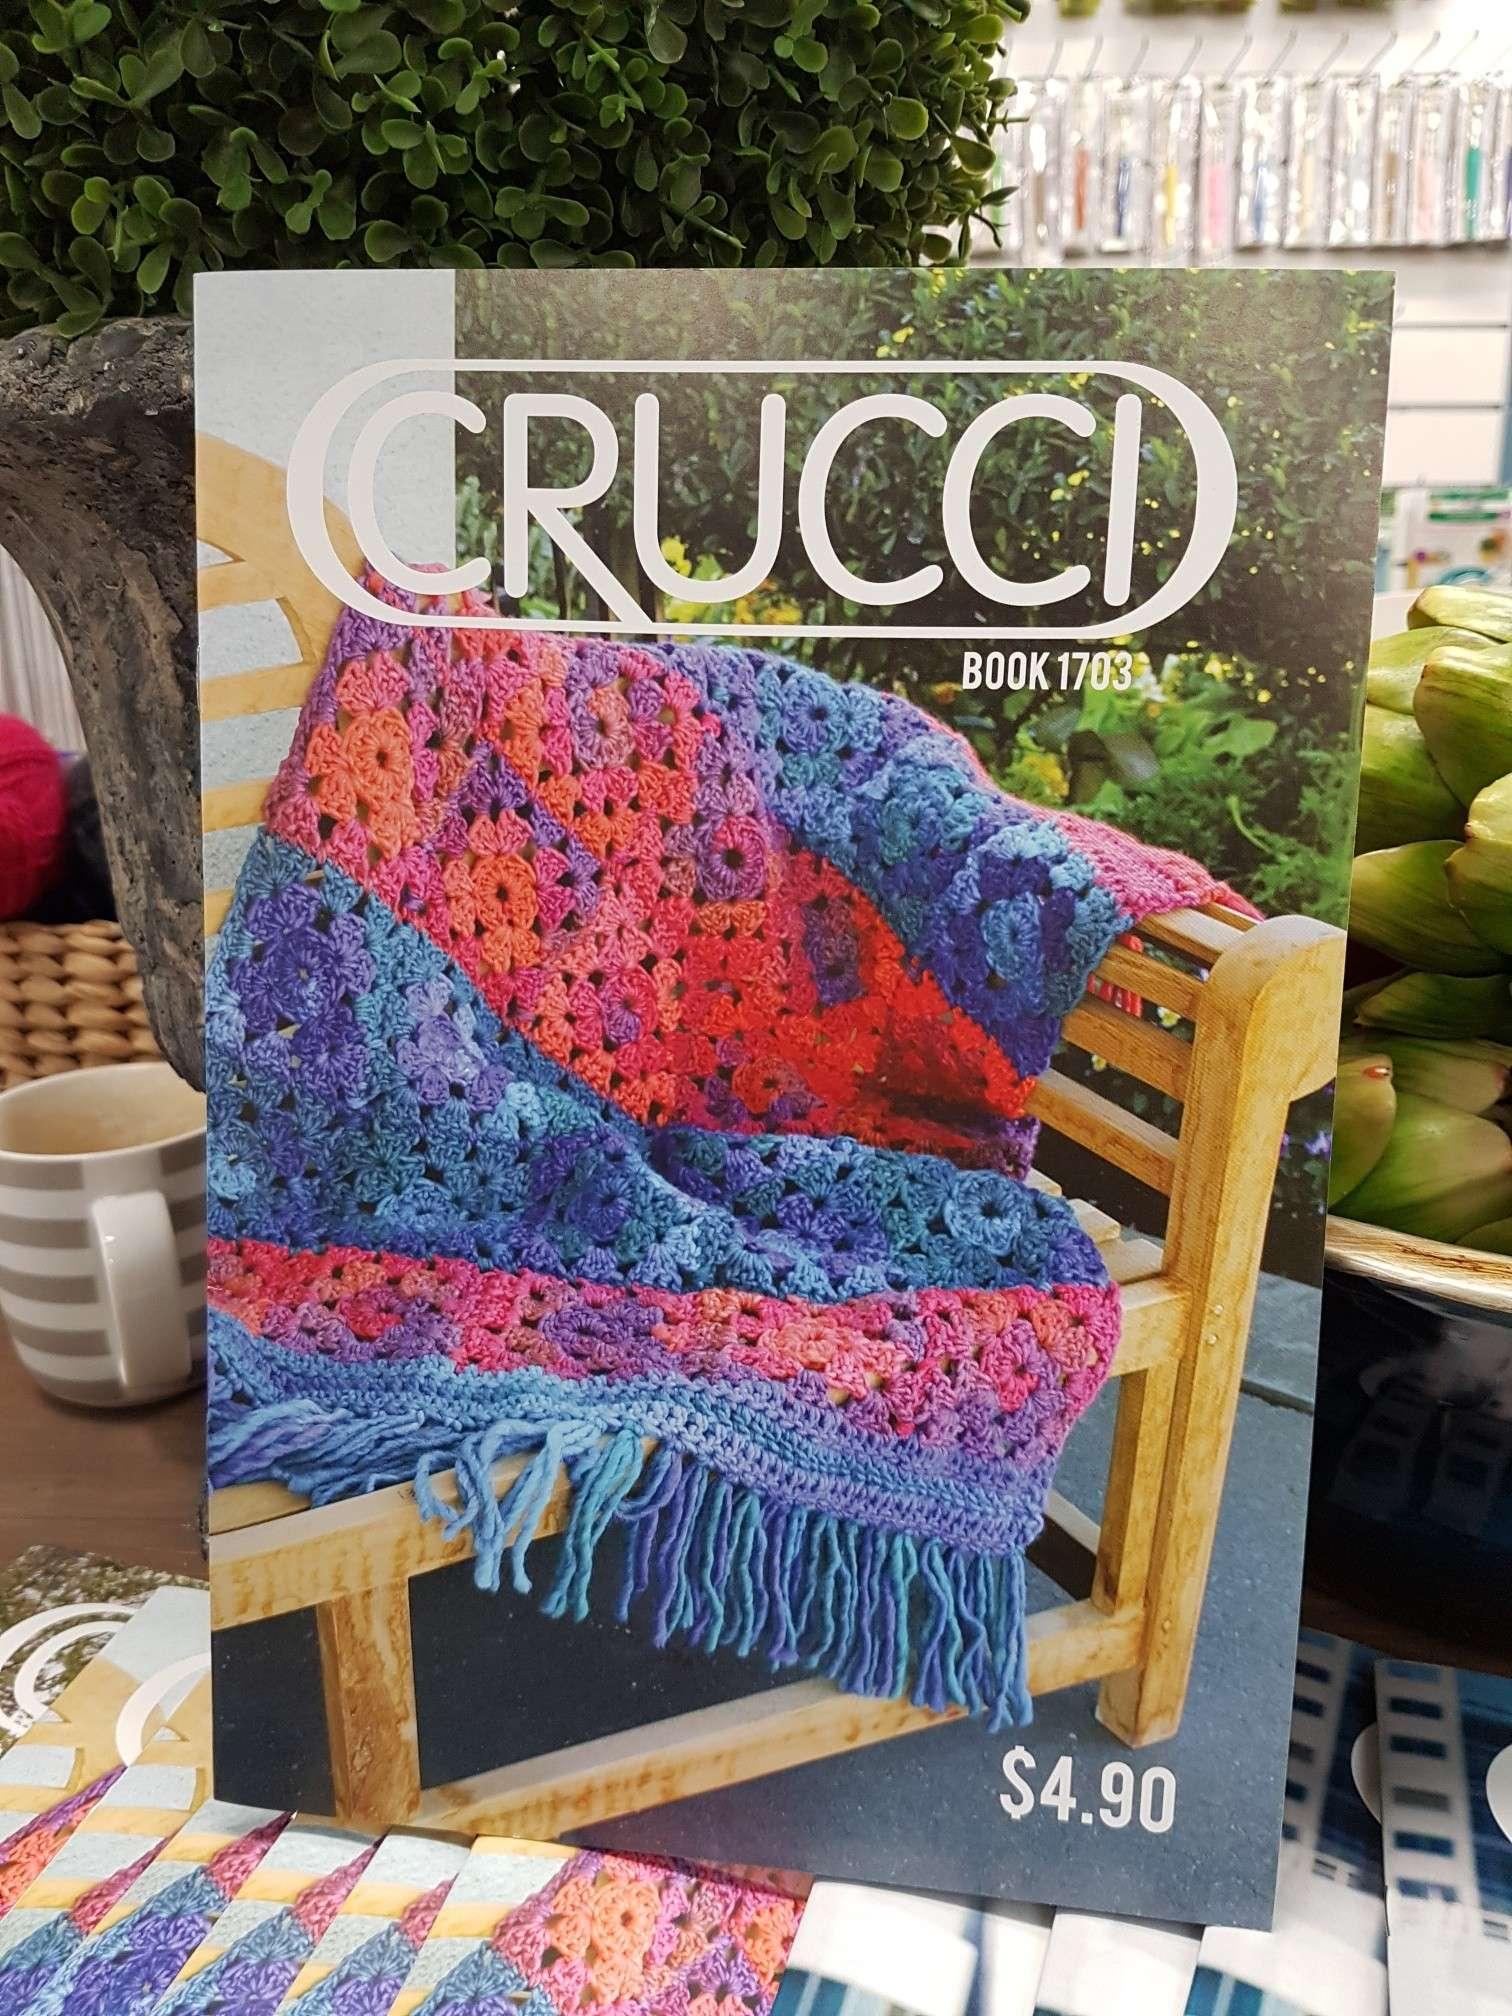 Crochet - The Next Step